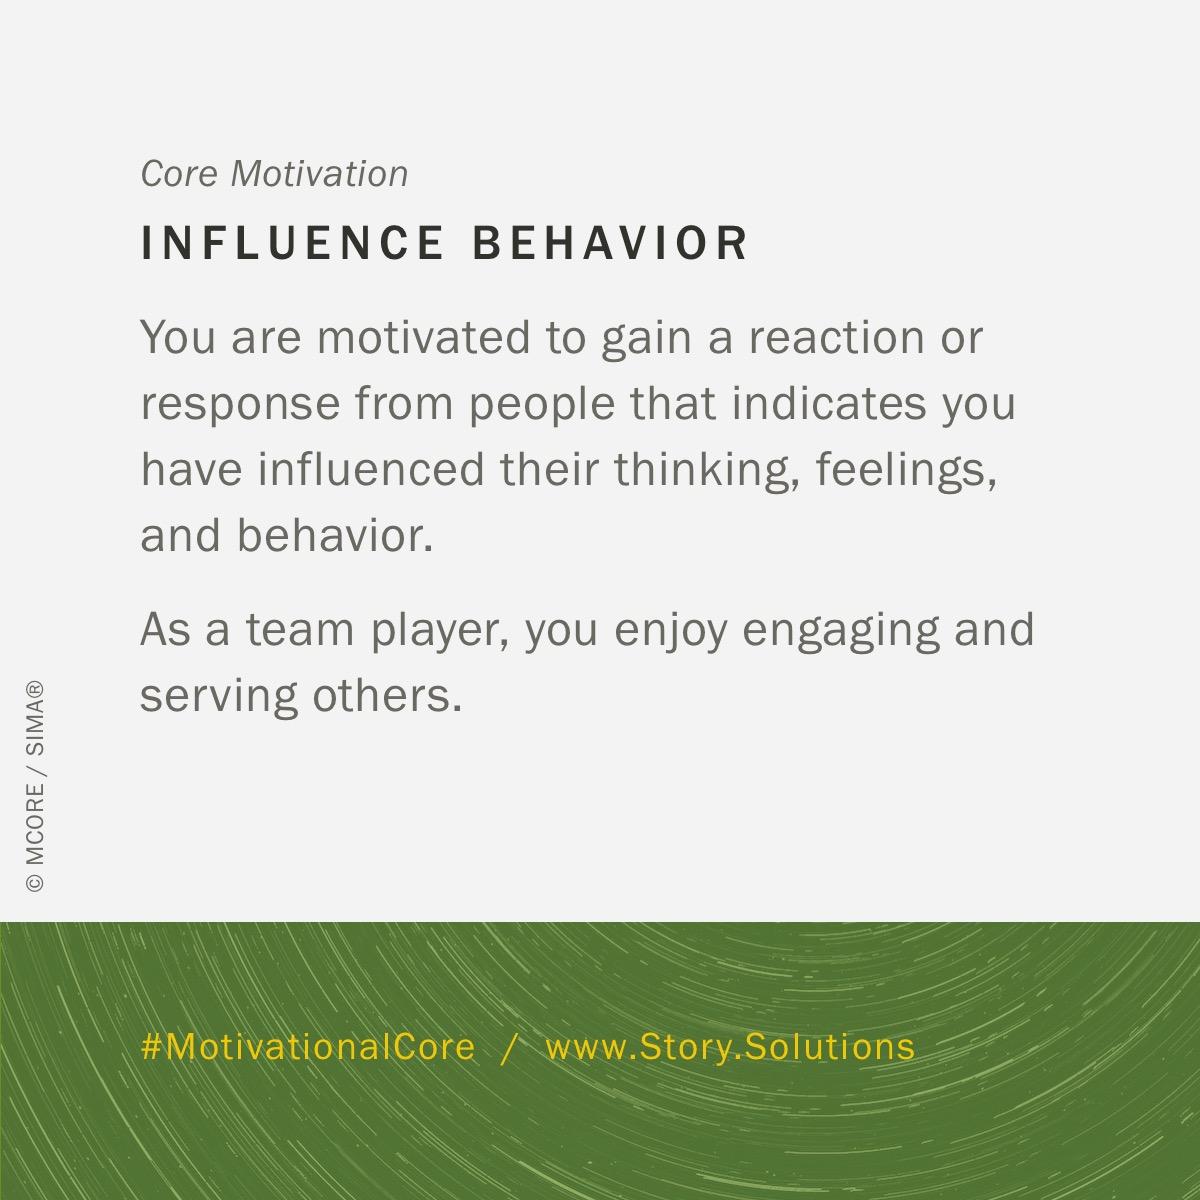 story-solutions-motivational-core-influence-behavior-4.jpeg